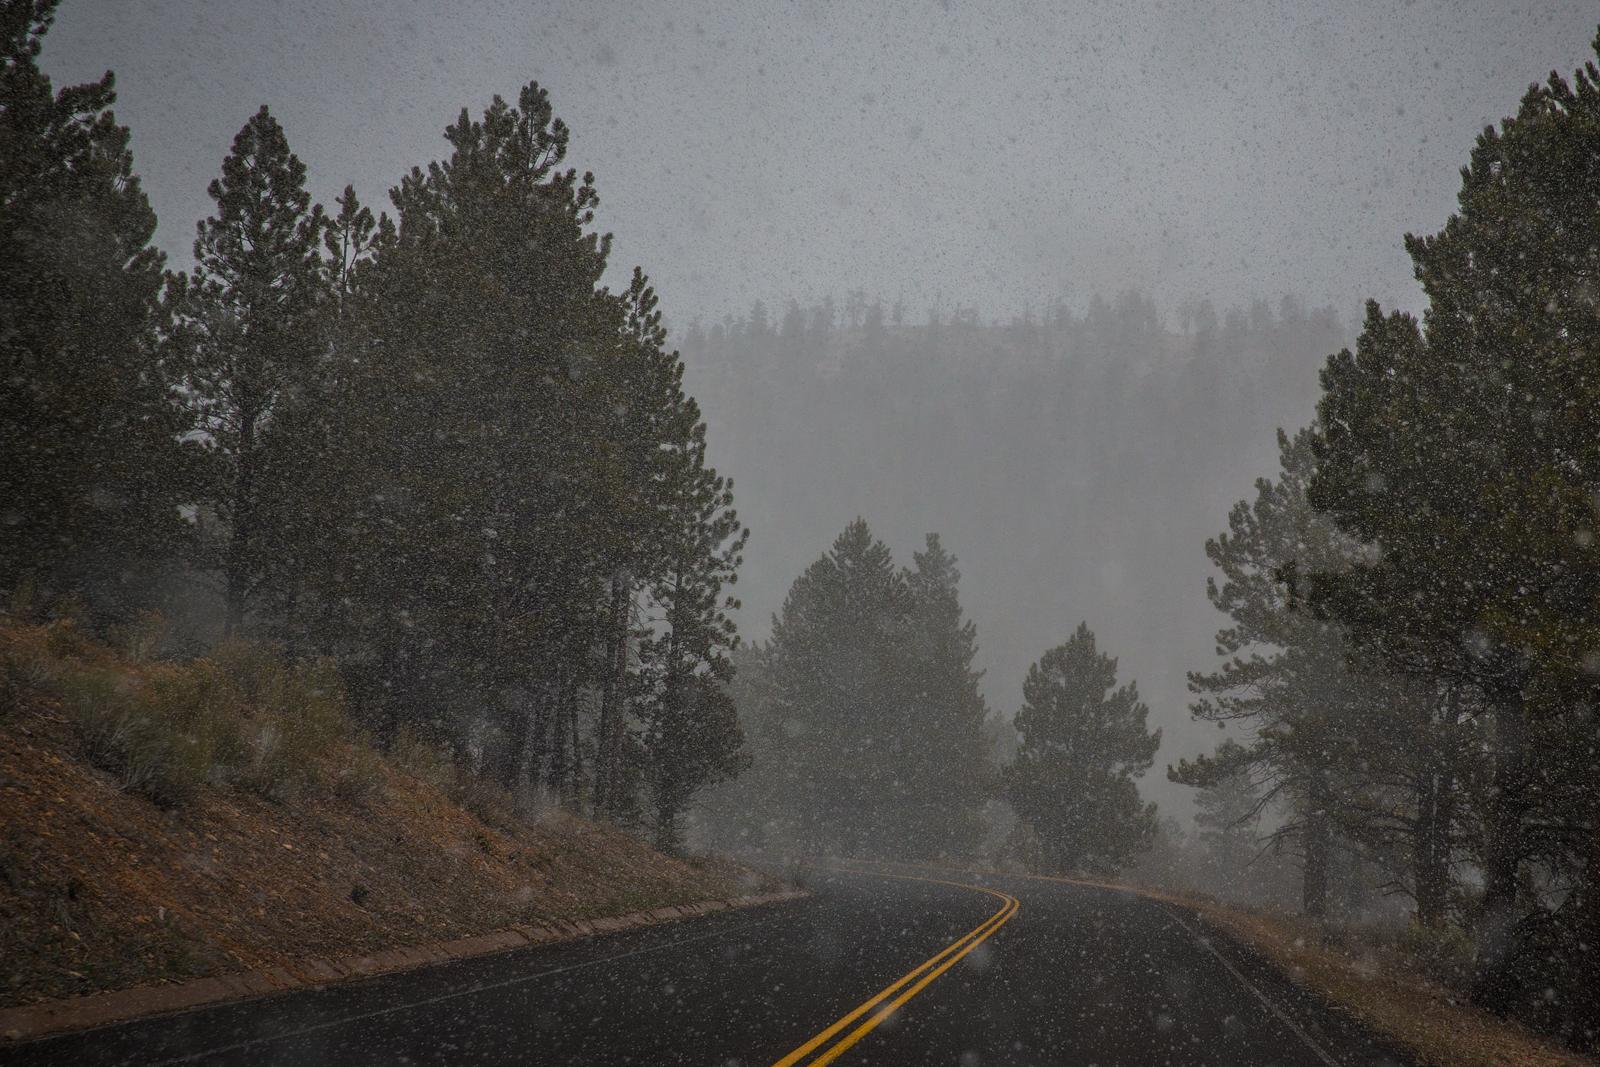 bolfo_0004s_0001_Snow in Bryce